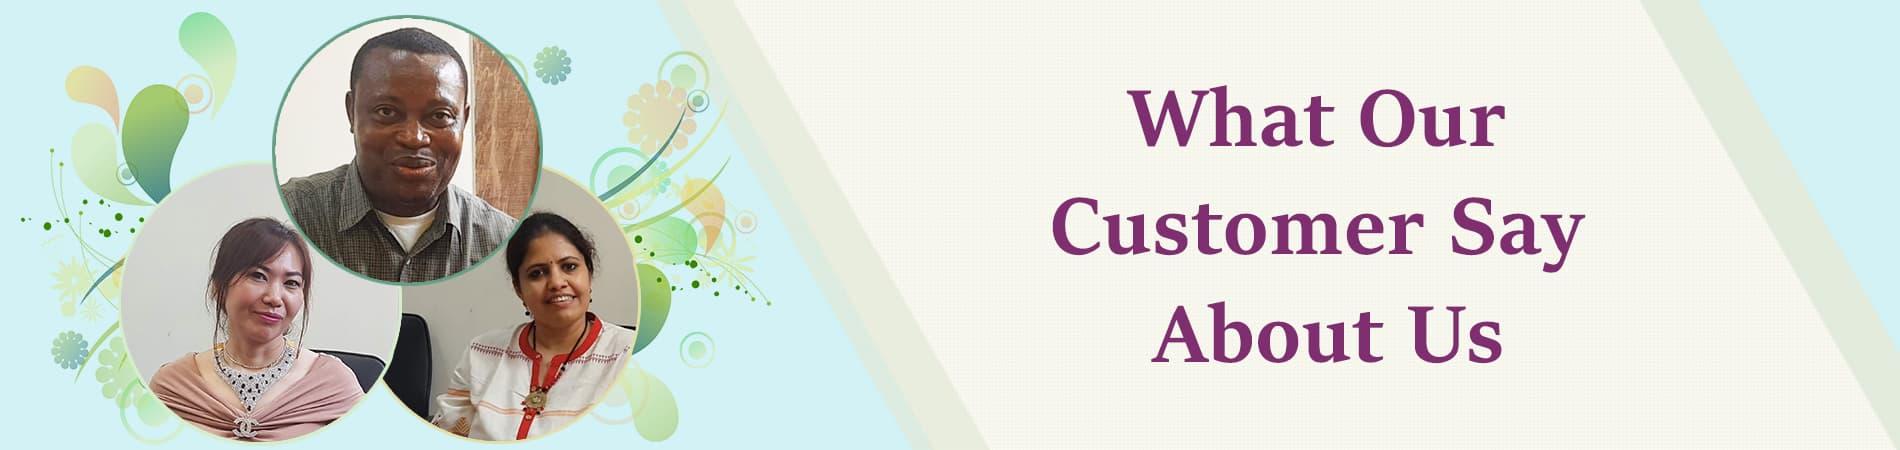 1598945049_1580714557_Customer_Testimonials_What_Customer_Say_About_Us.jpg